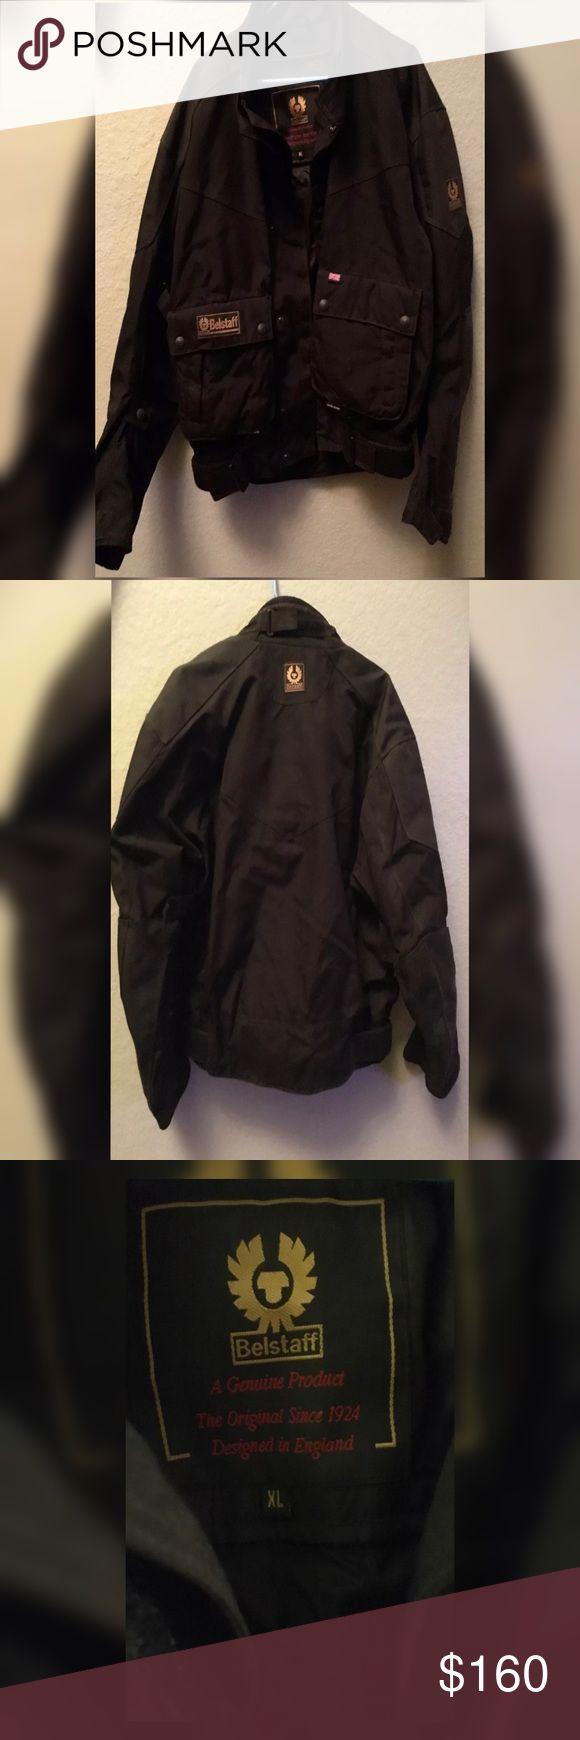 Belstaff Jacket Belstaff jacket Belstaff Jackets & Coats Utility Jackets